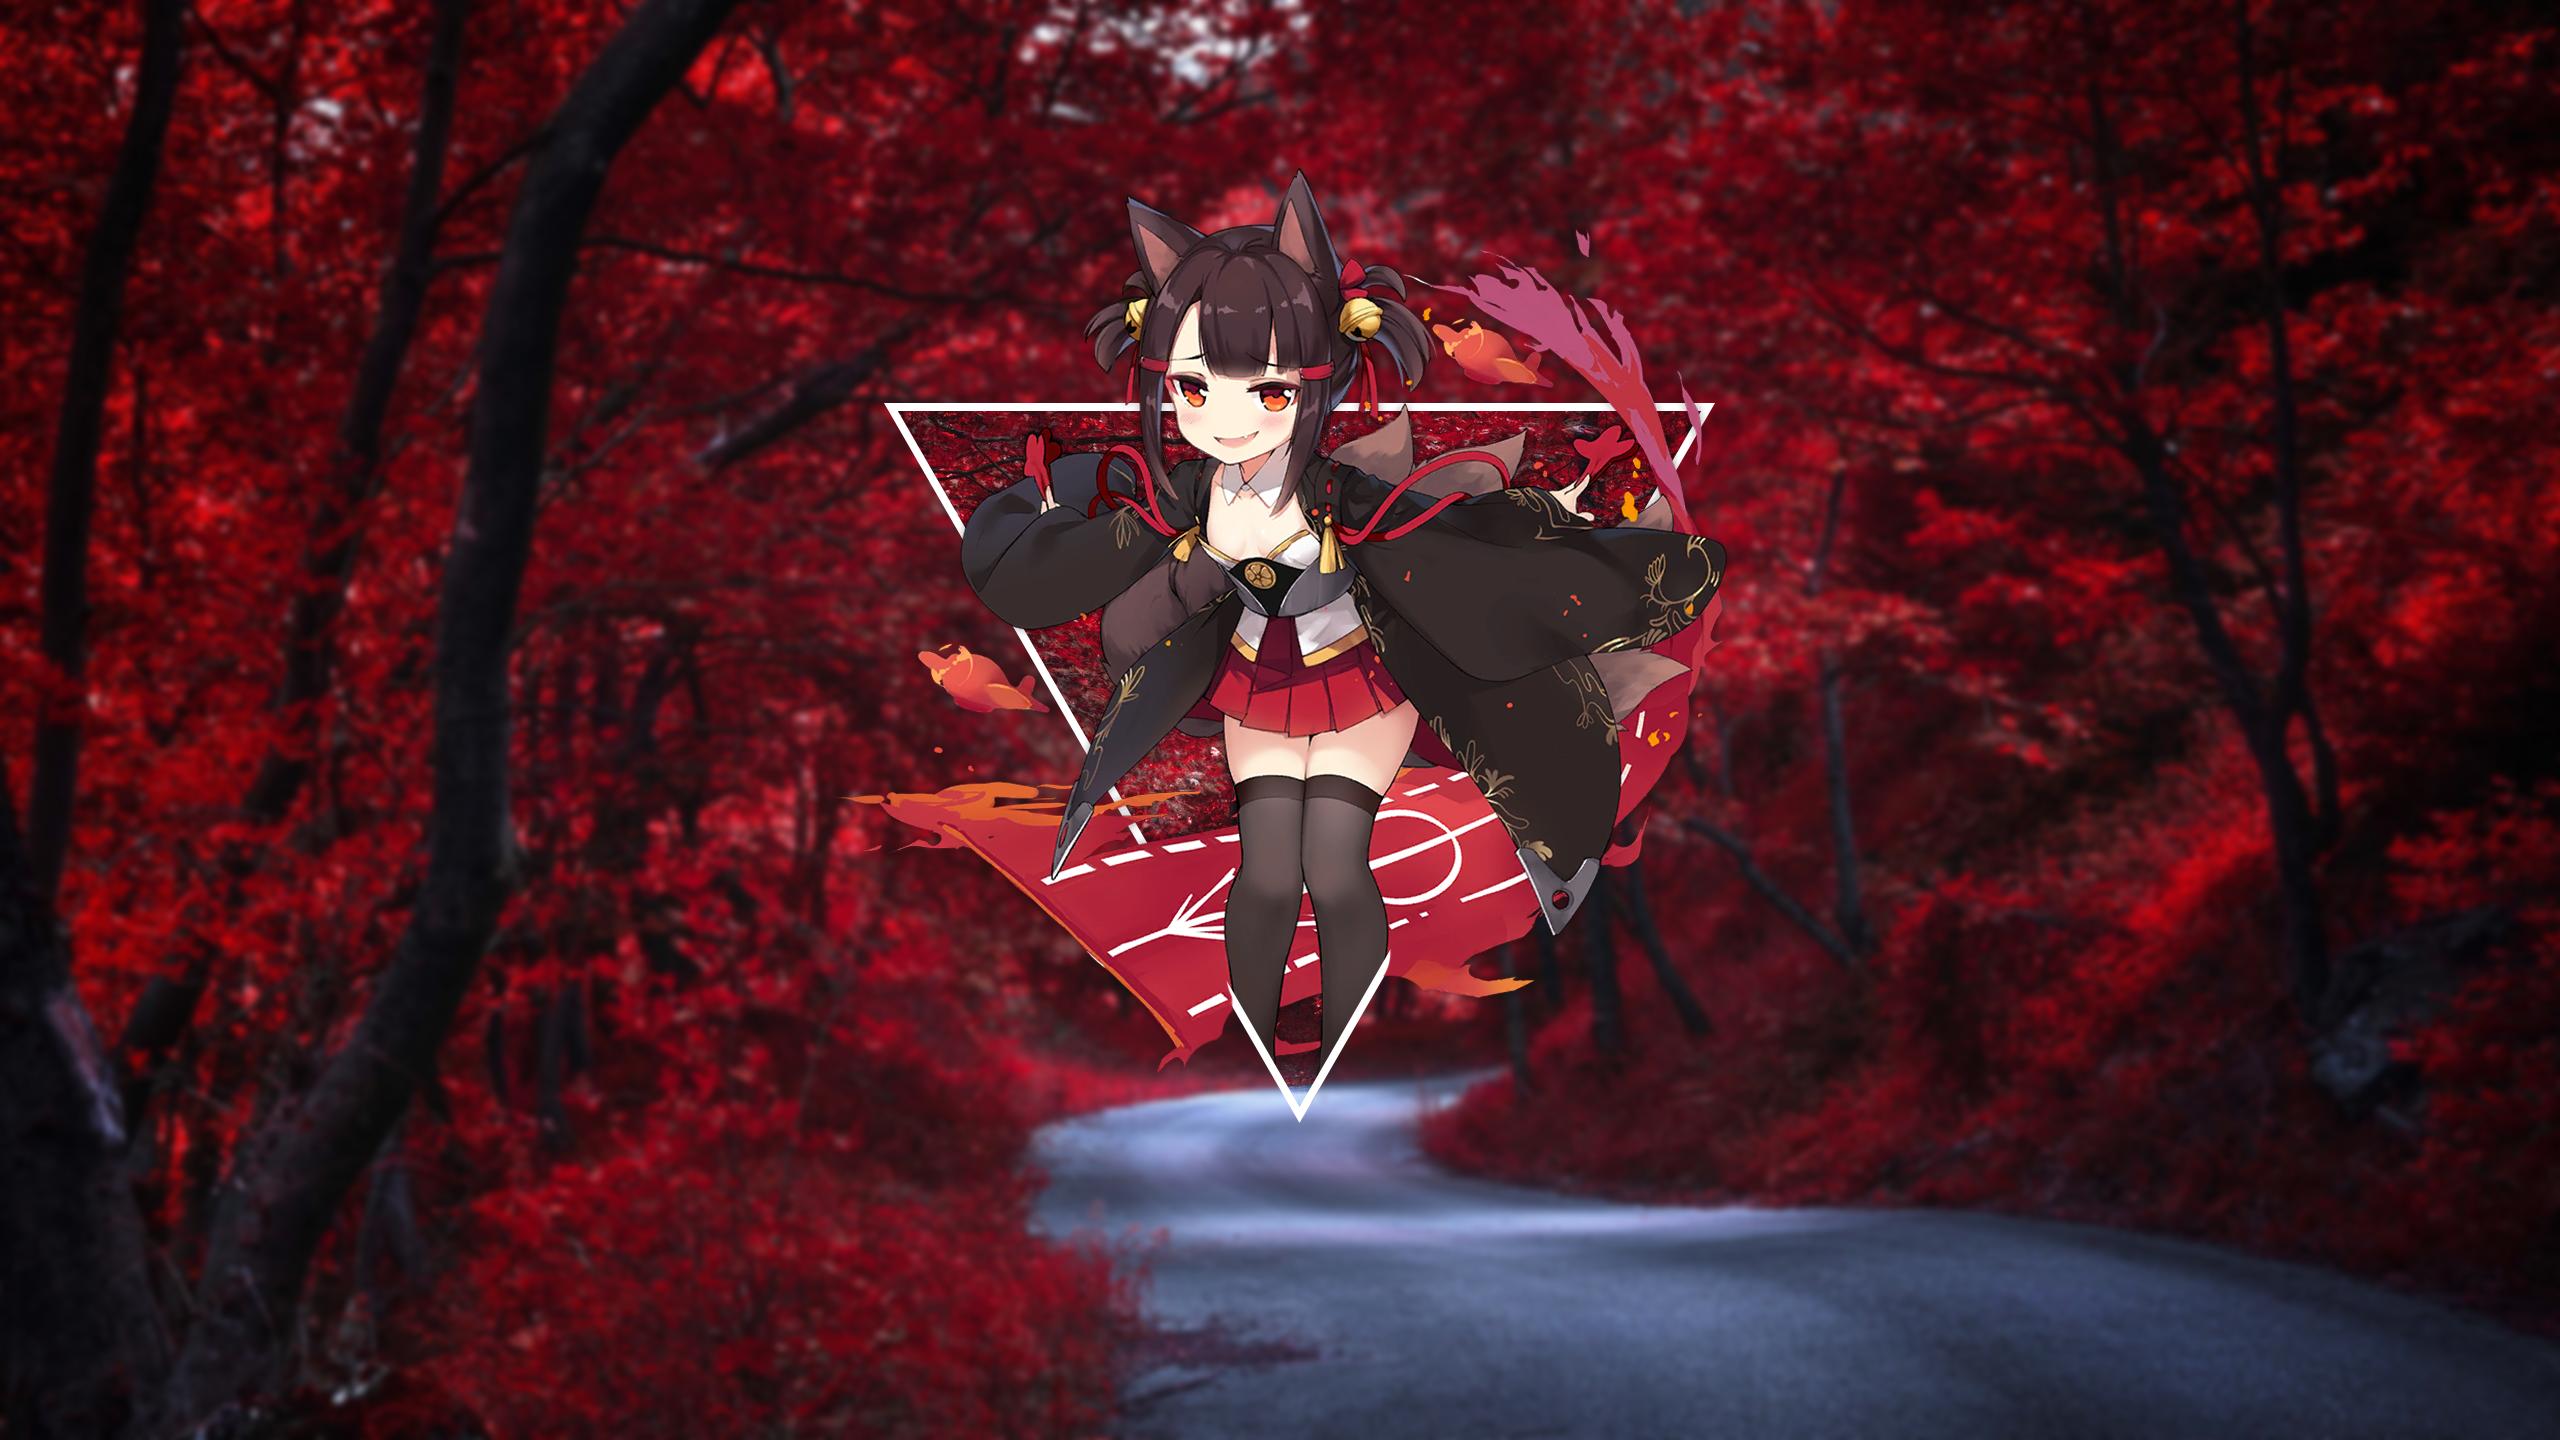 Anime 2560x1440 anime render in shapes anime girls stockings miniskirt animal ears red eyes Azur Lane Akagi-Chan (Azur Lane)